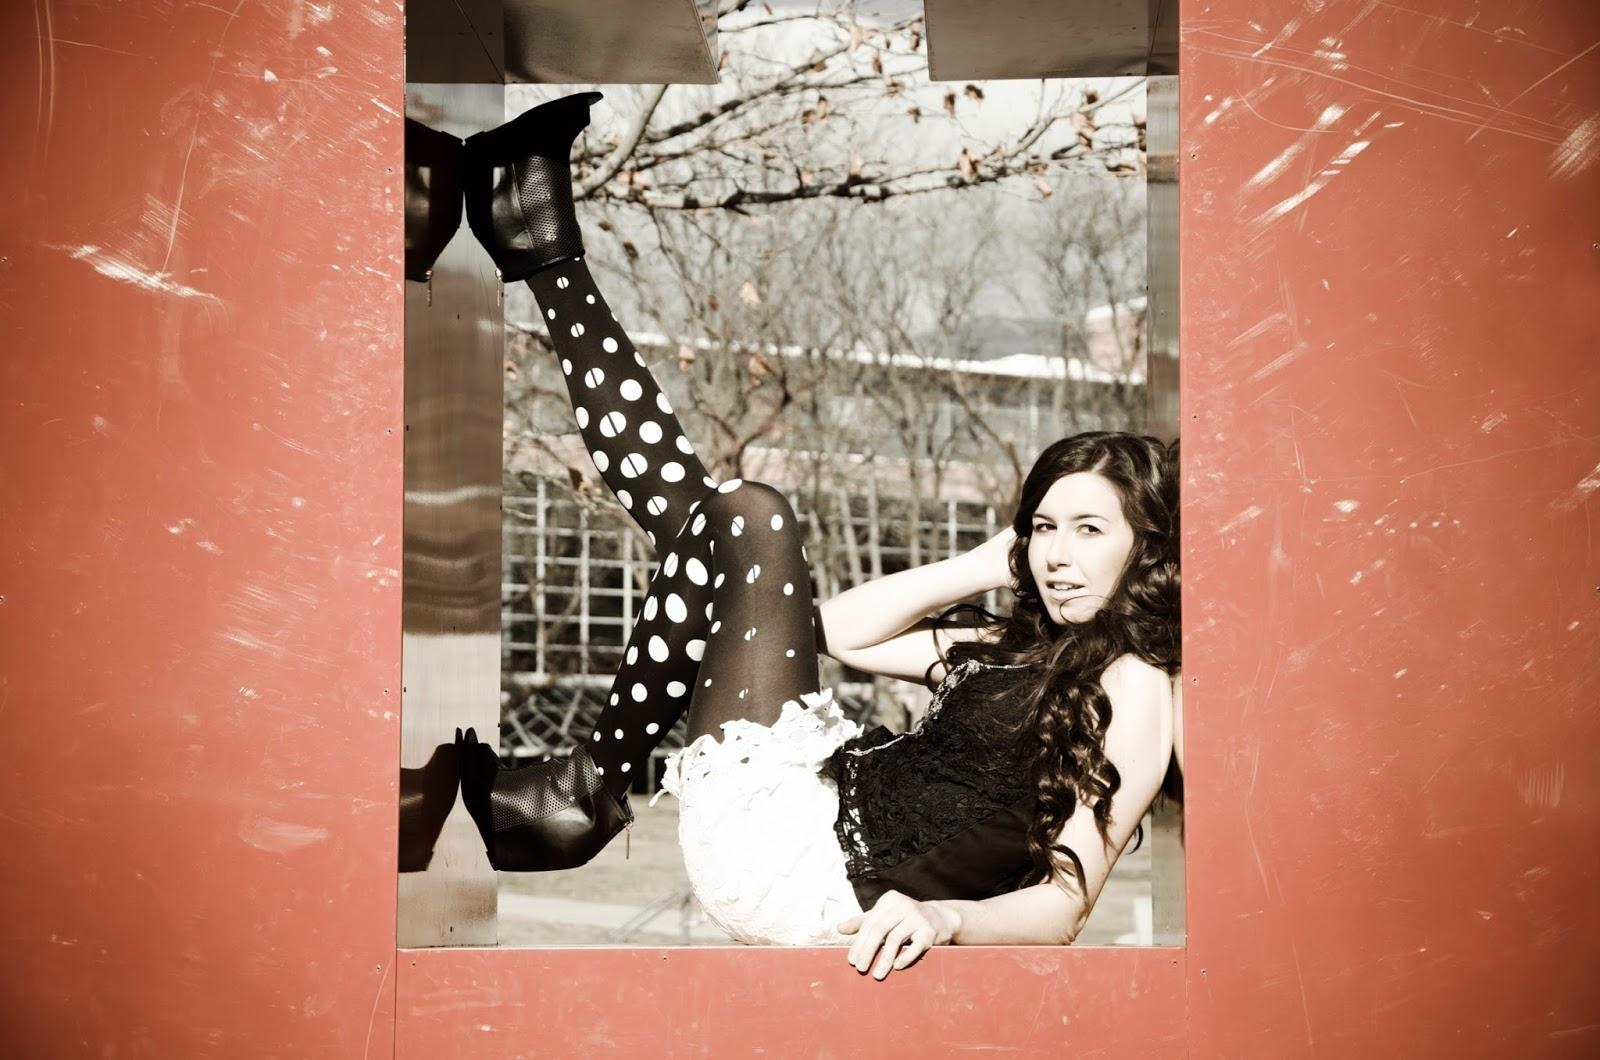 university of utah photoshoot, lace top, lace skirt, lace peplum top, polka dot tights, polka dots, polka dots on tights, trendylegs tights, trendy legs, trendyfine fashion, floral lace skirt, lace tank top,